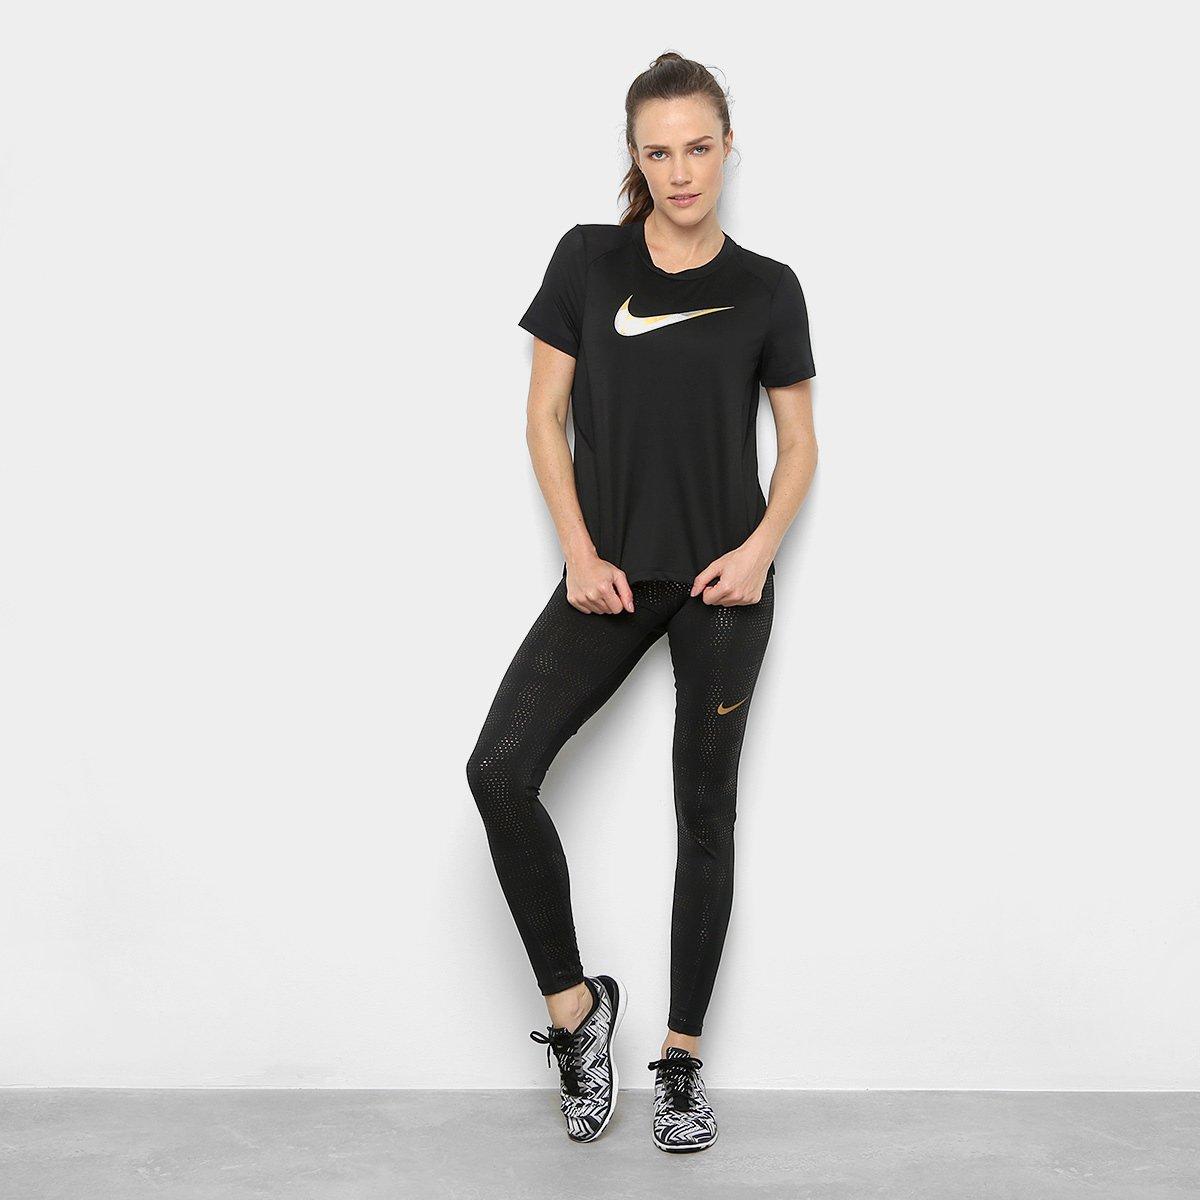 10f973c44a ... Camiseta Nike Miler Ss Metallic Feminina - Preto - Compre Agora ...  416a4b307ebe5d  Camiseta Nike Dry Cool Miler SS Masculina ...